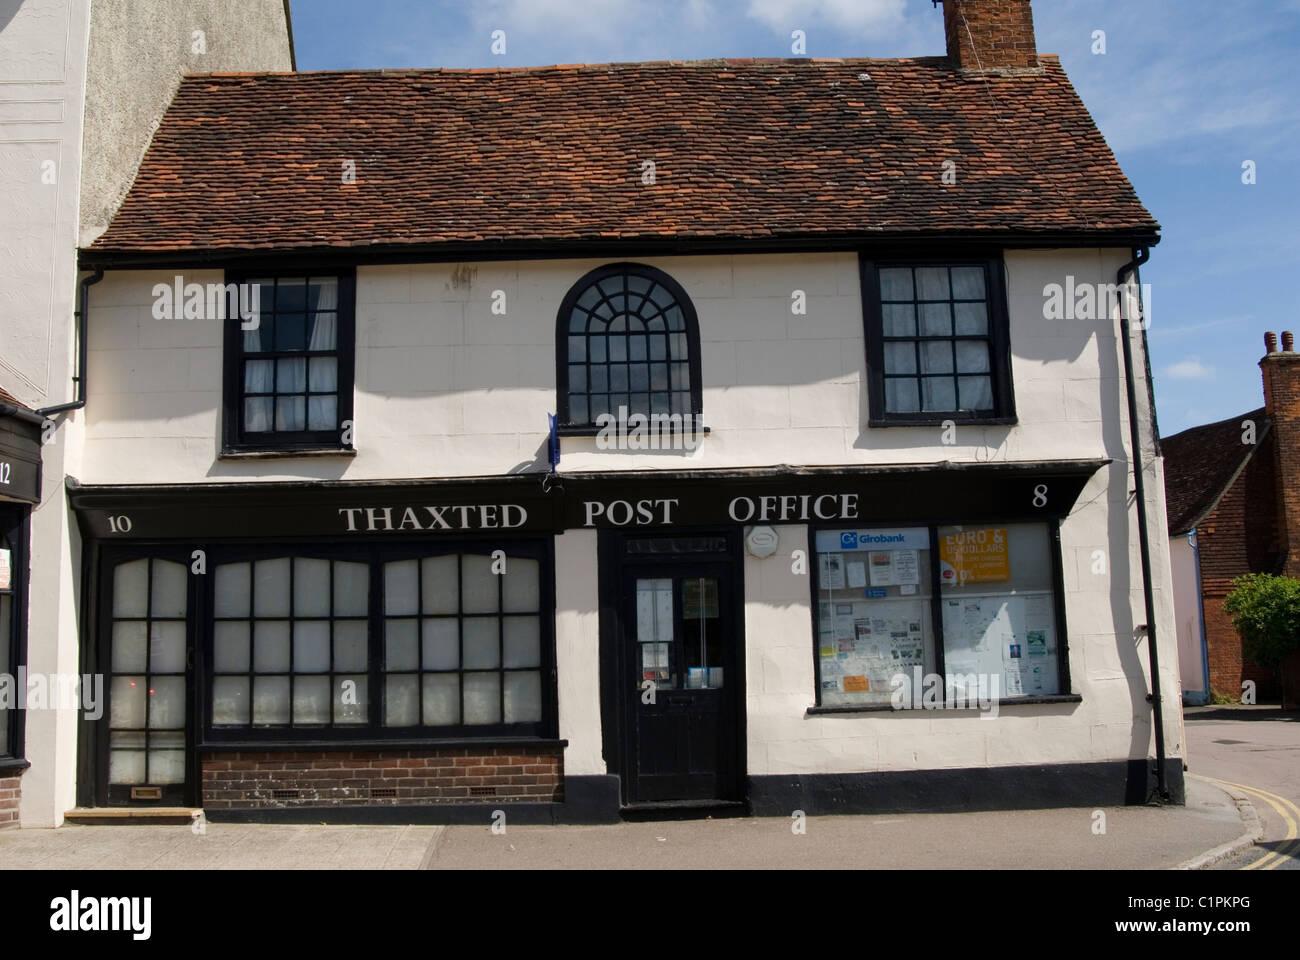 Inglaterra, Essex, Thaxted Post office, fachada Imagen De Stock